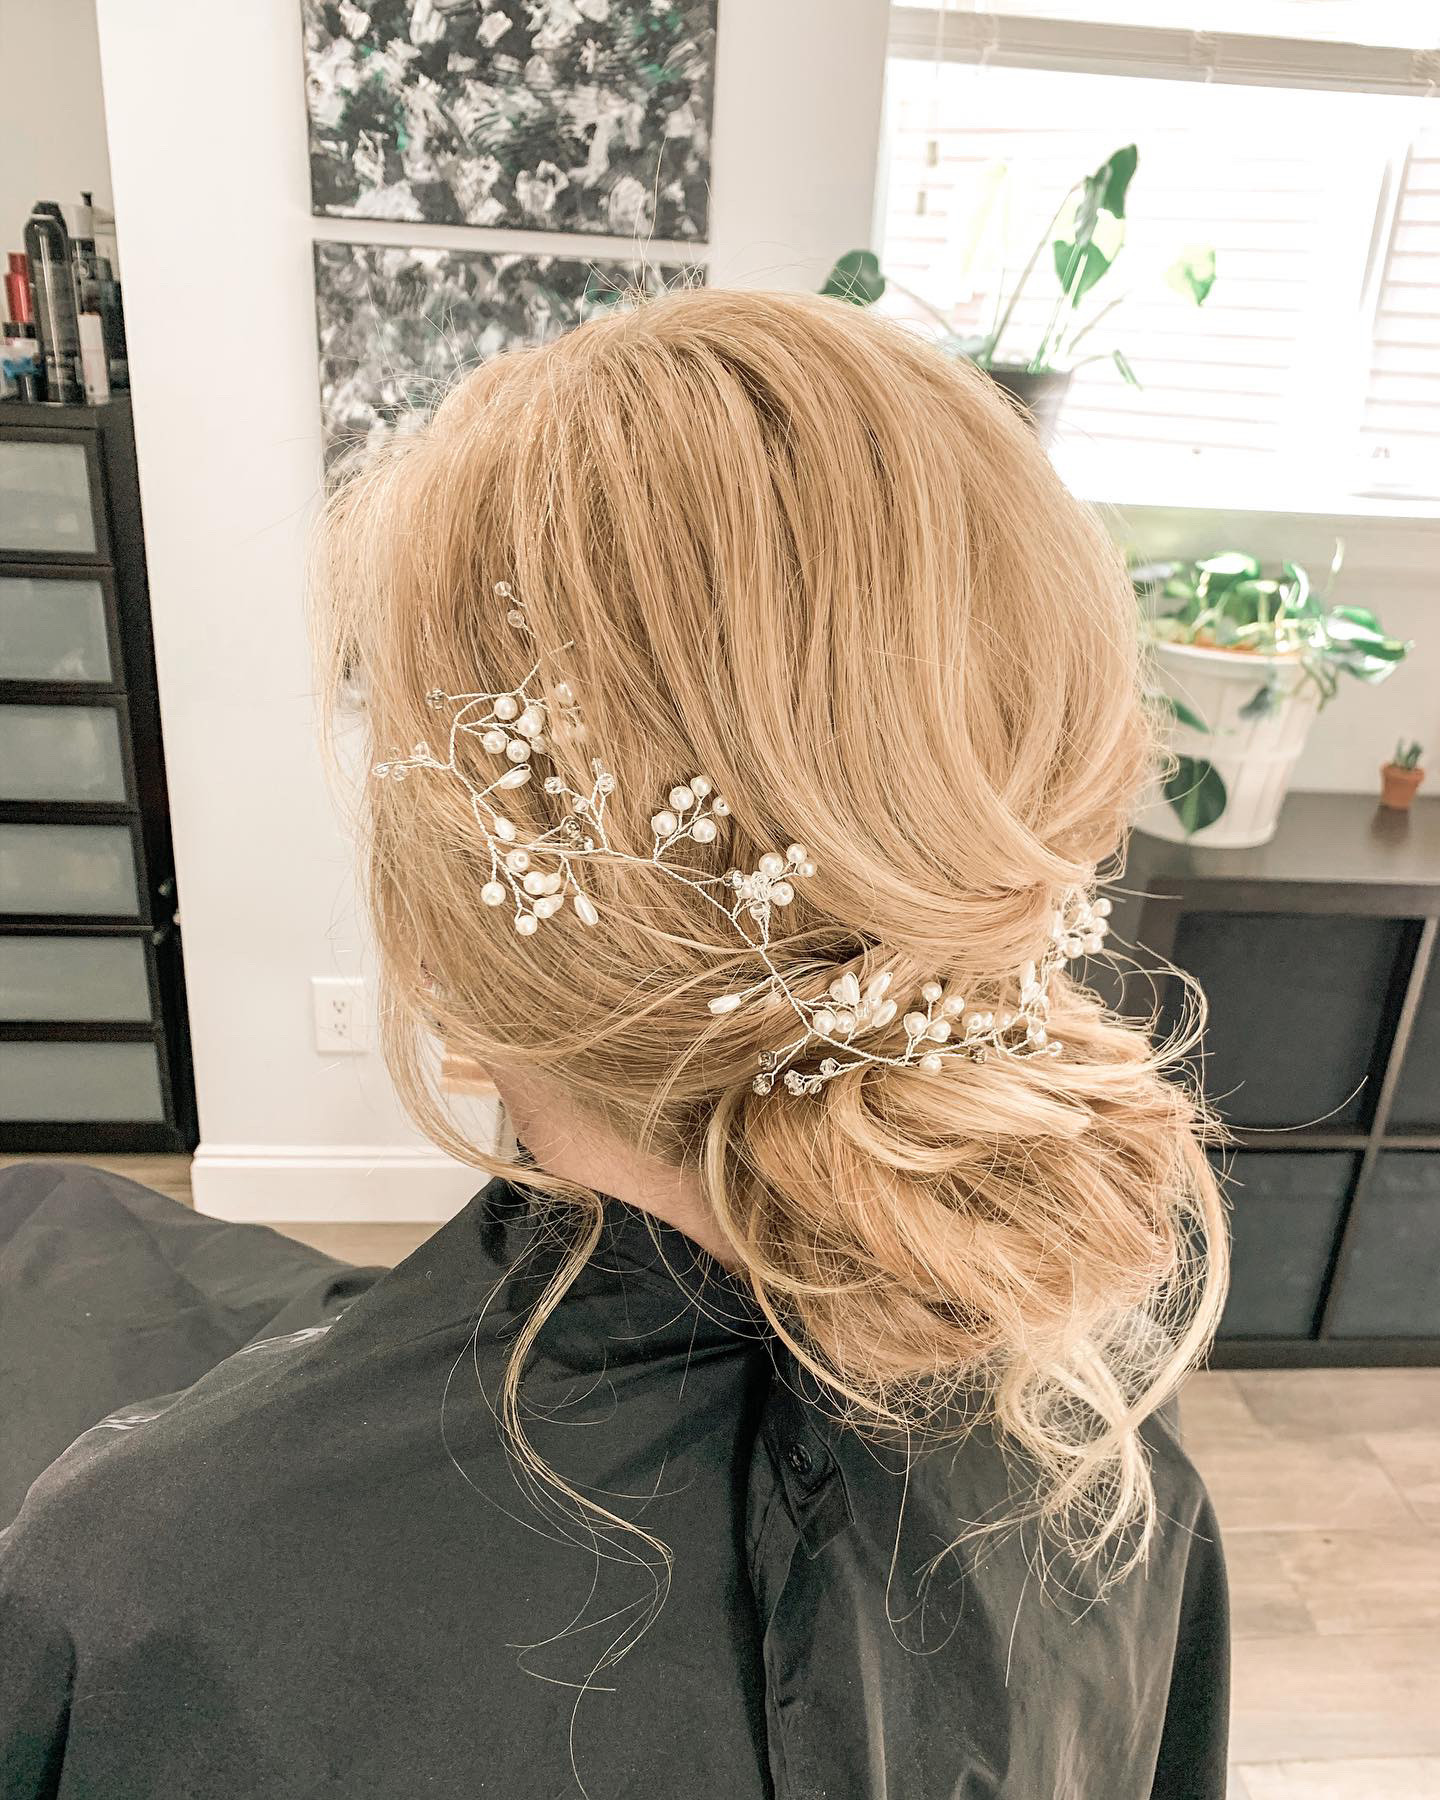 Bridal Hair (Includes Trial)